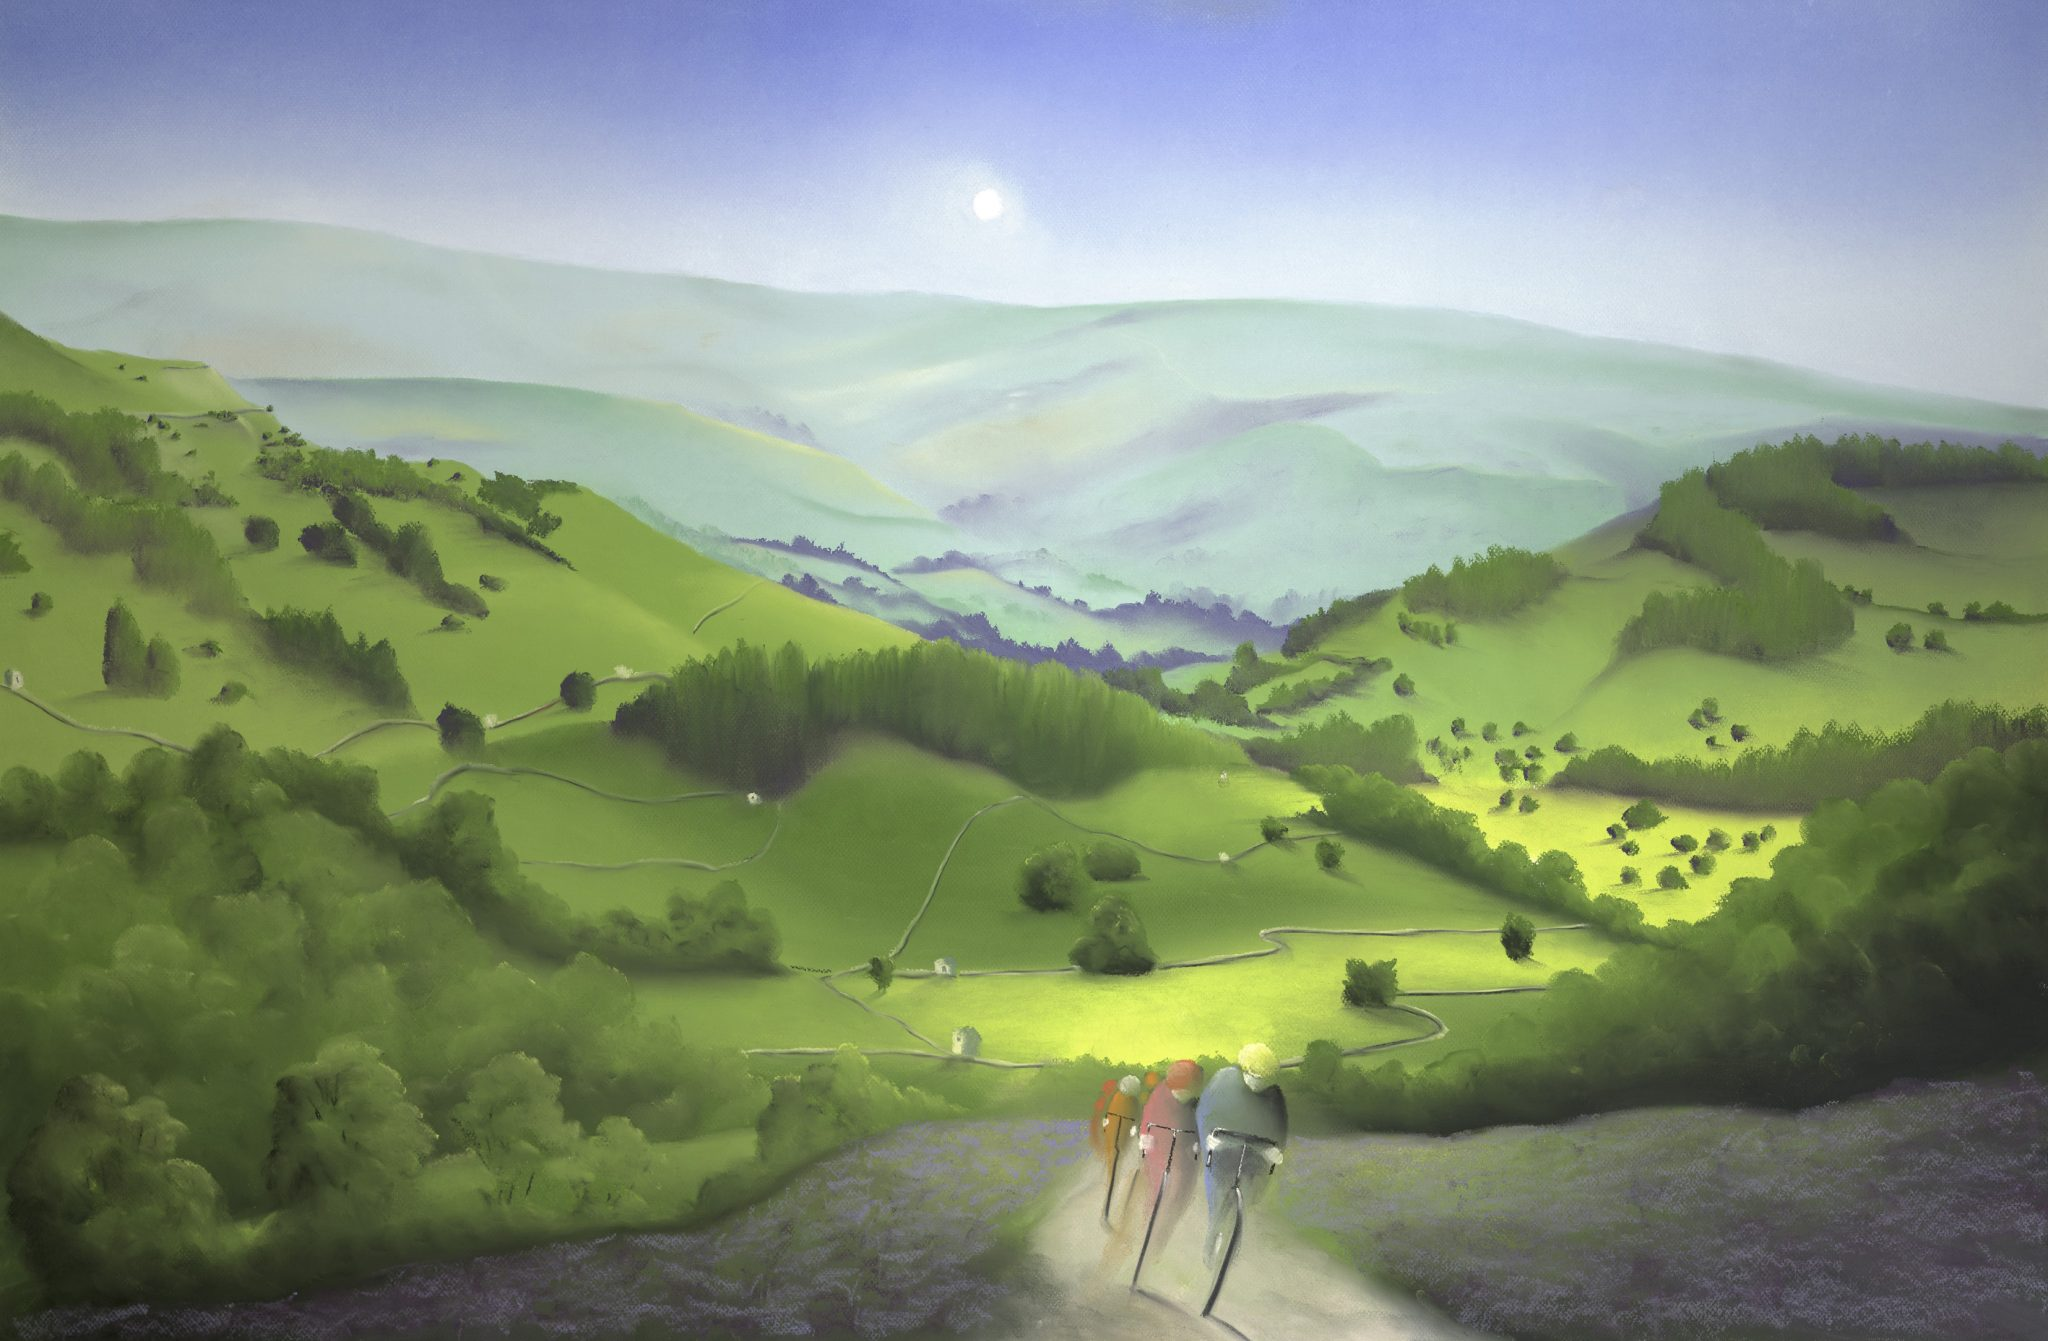 Over Moor and Dale Artist Mackenzie Thorpe